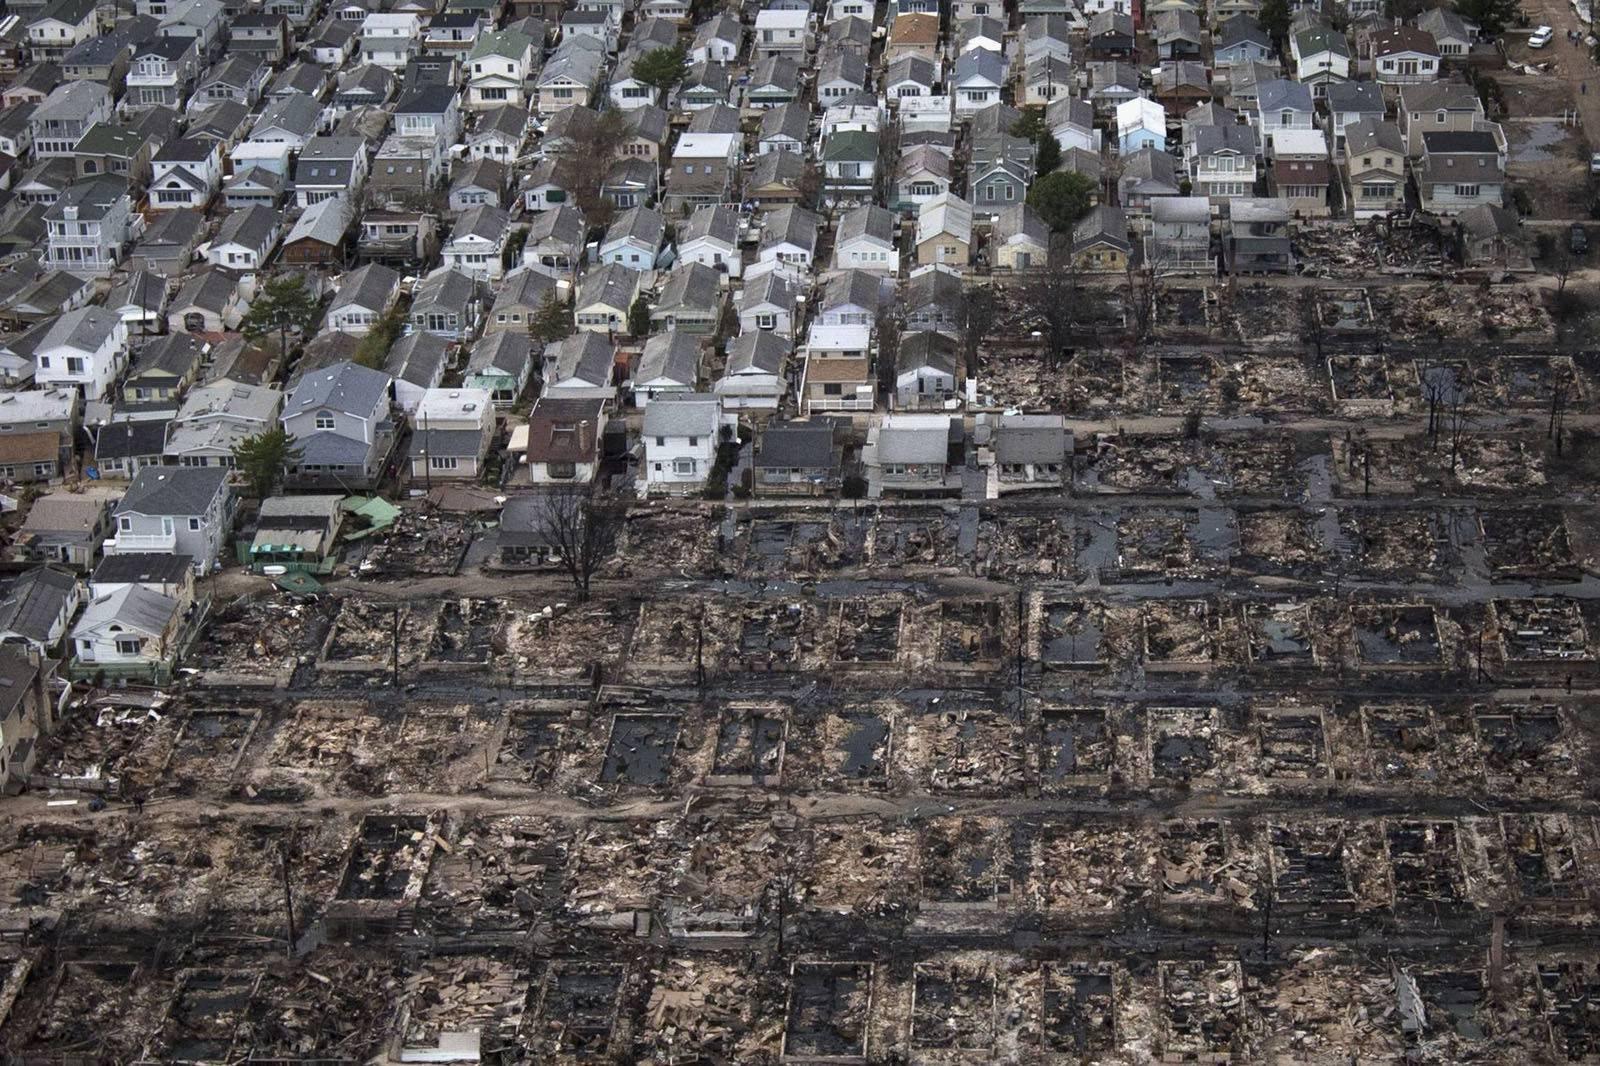 Захватывающие фотографии катастроф и ...: www.bugaga.ru/pictures/1146742212-zahvatyvayuschie-fotografii...